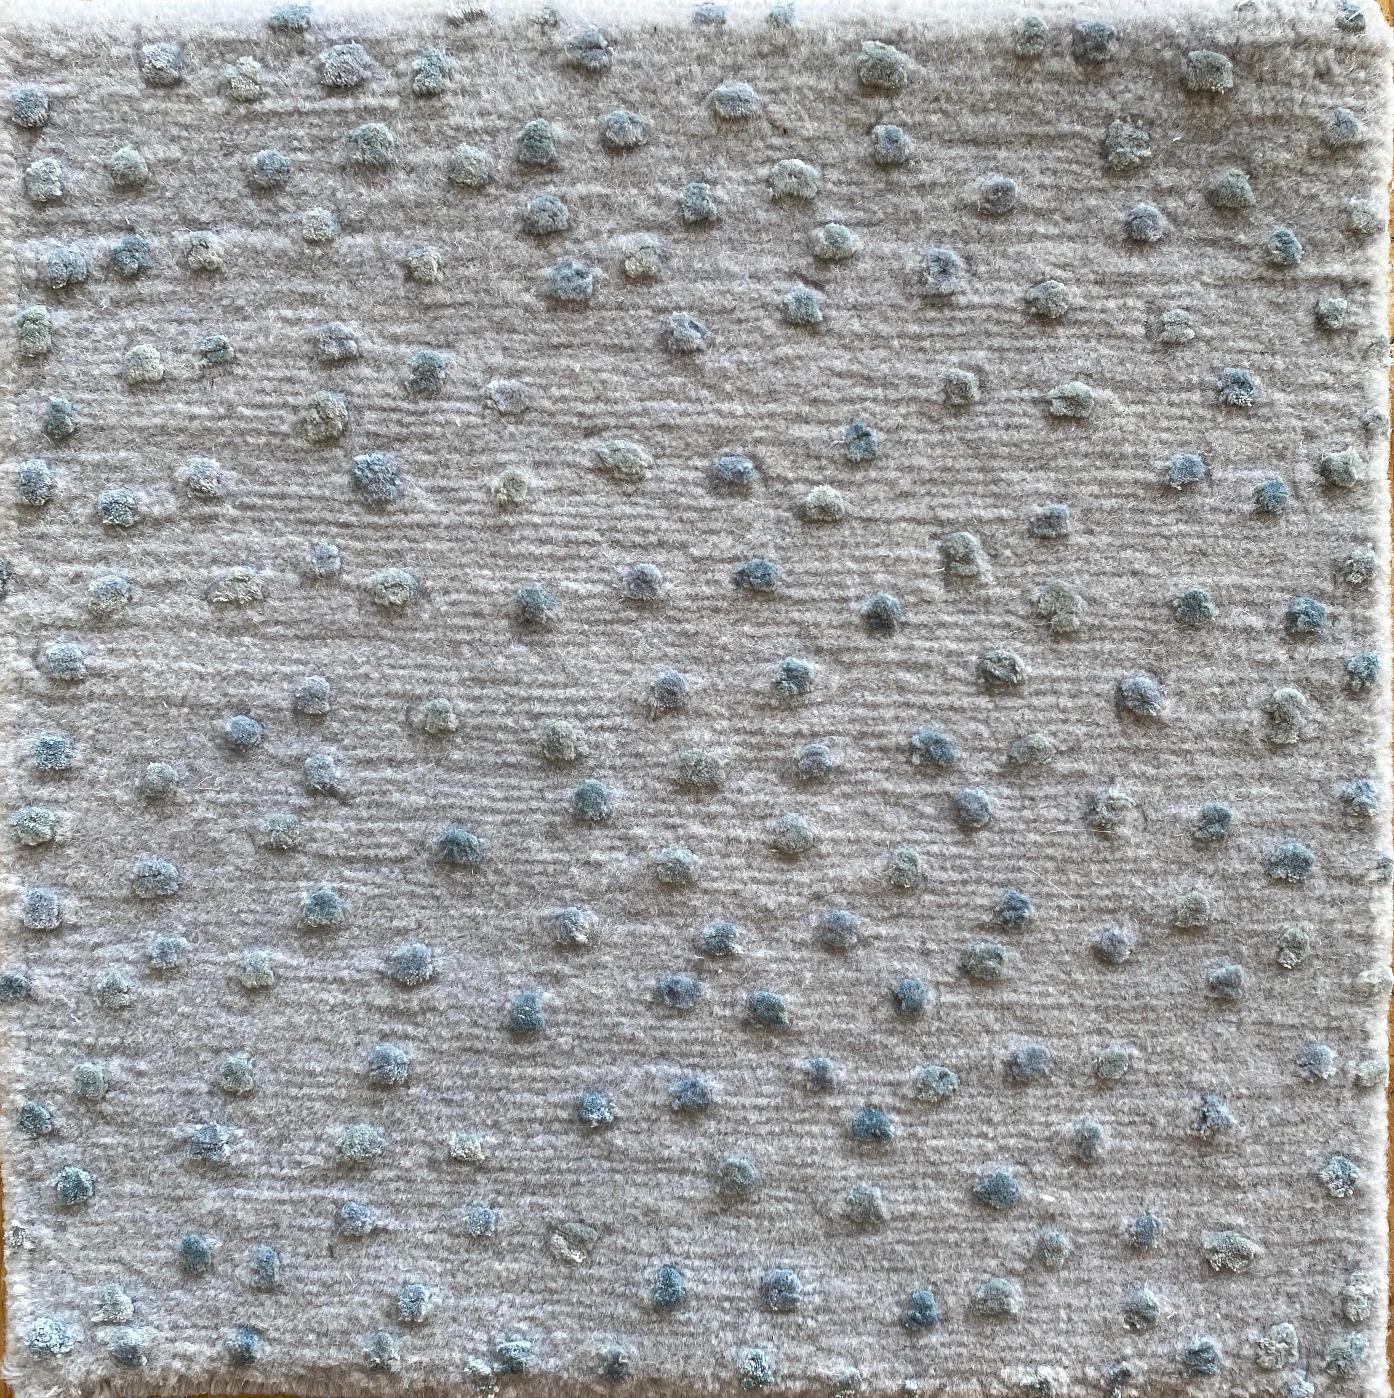 78 Confetti; Clay, Dusk